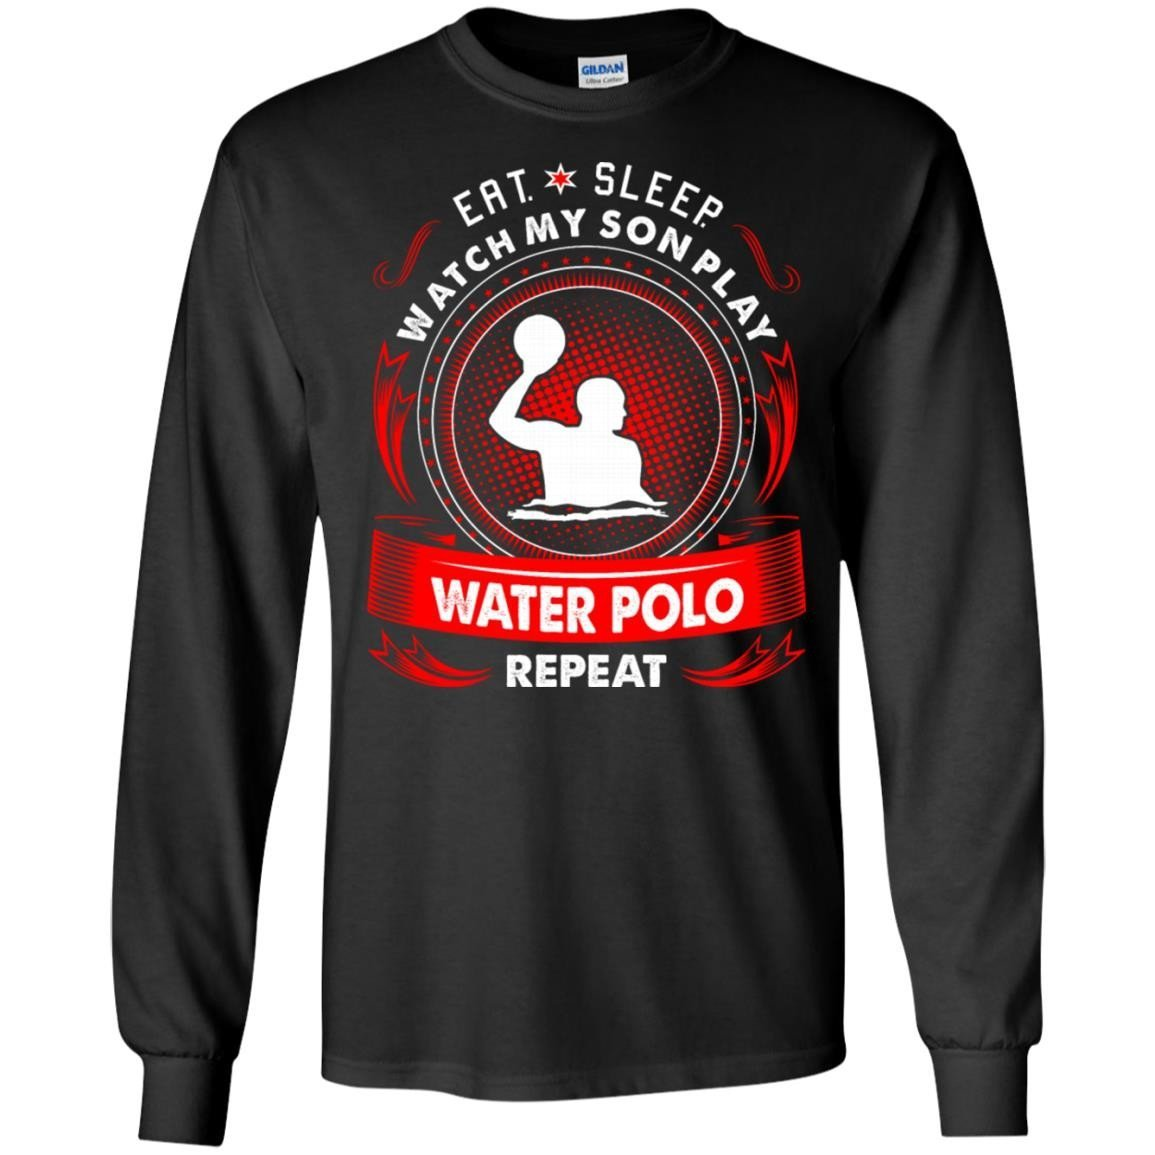 Eat Sleep Watch My Son Play Wate Polo Repeat Shirt T Shirt Long Sleeve 240